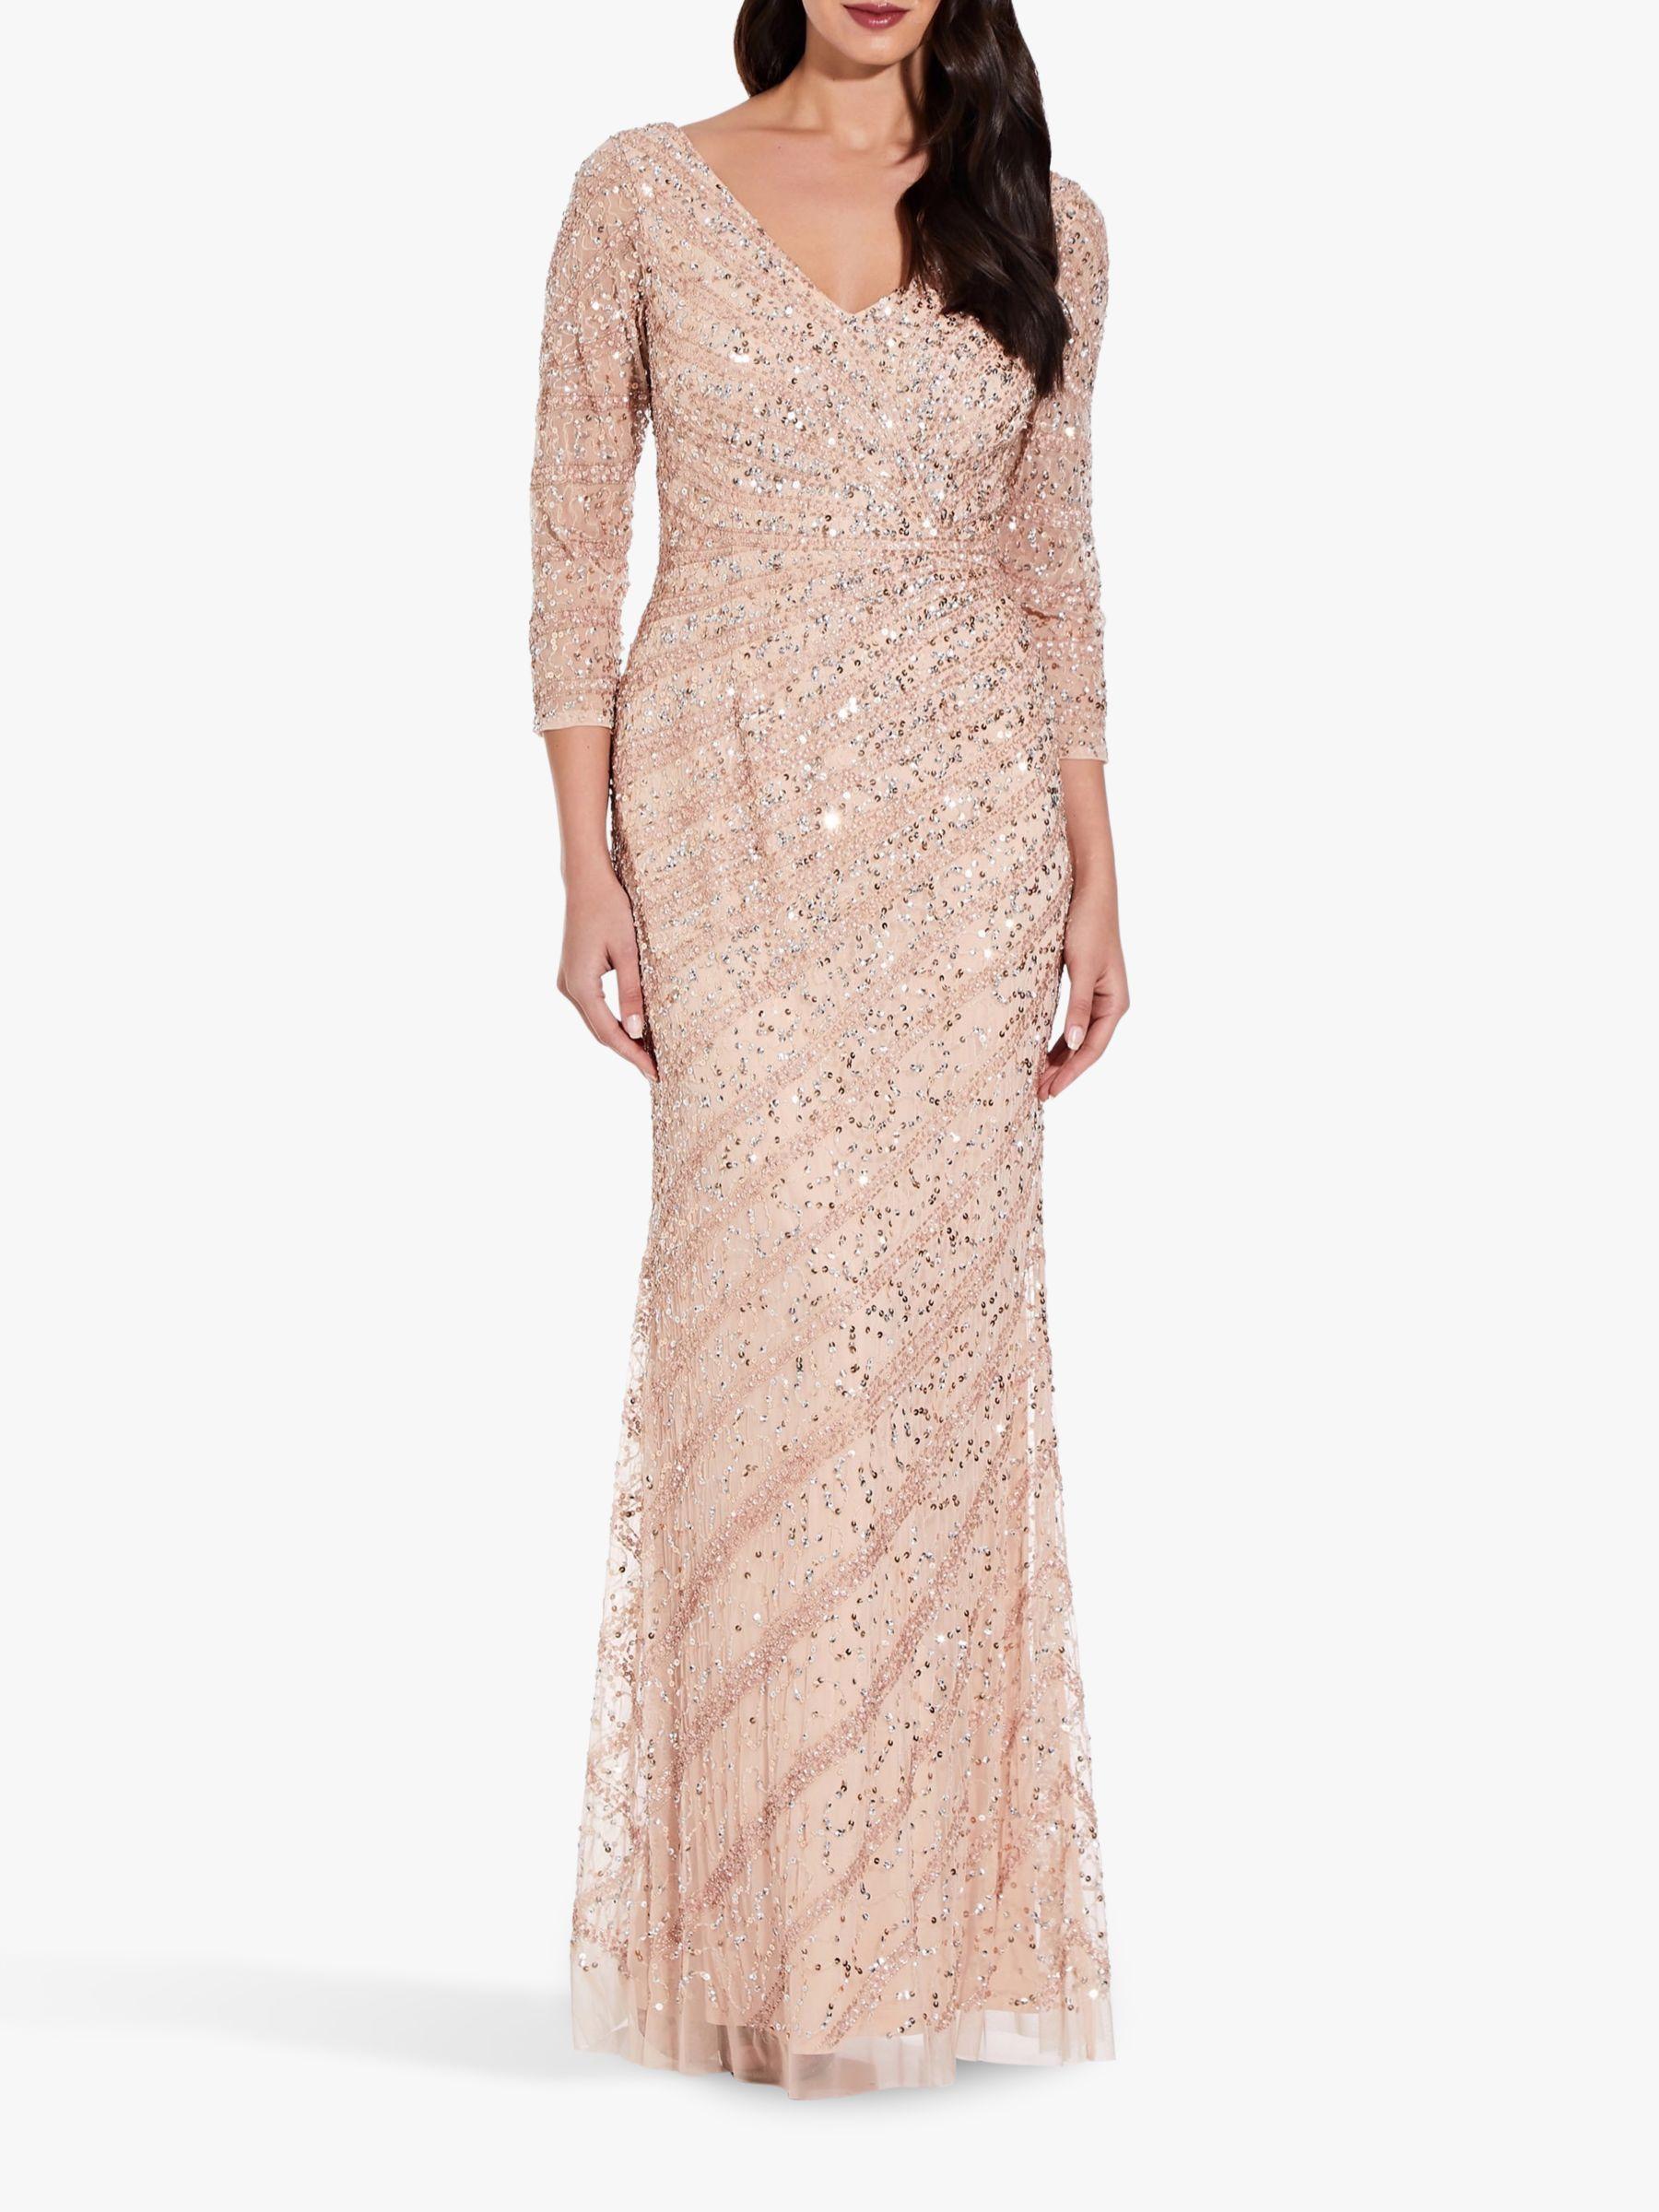 Adrianna Papell 3 4 Length Sleeve Embellished Maxi Dress Champagne Sand Embellished Maxi Dress Maxi Dress Dresses [ 2400 x 1800 Pixel ]